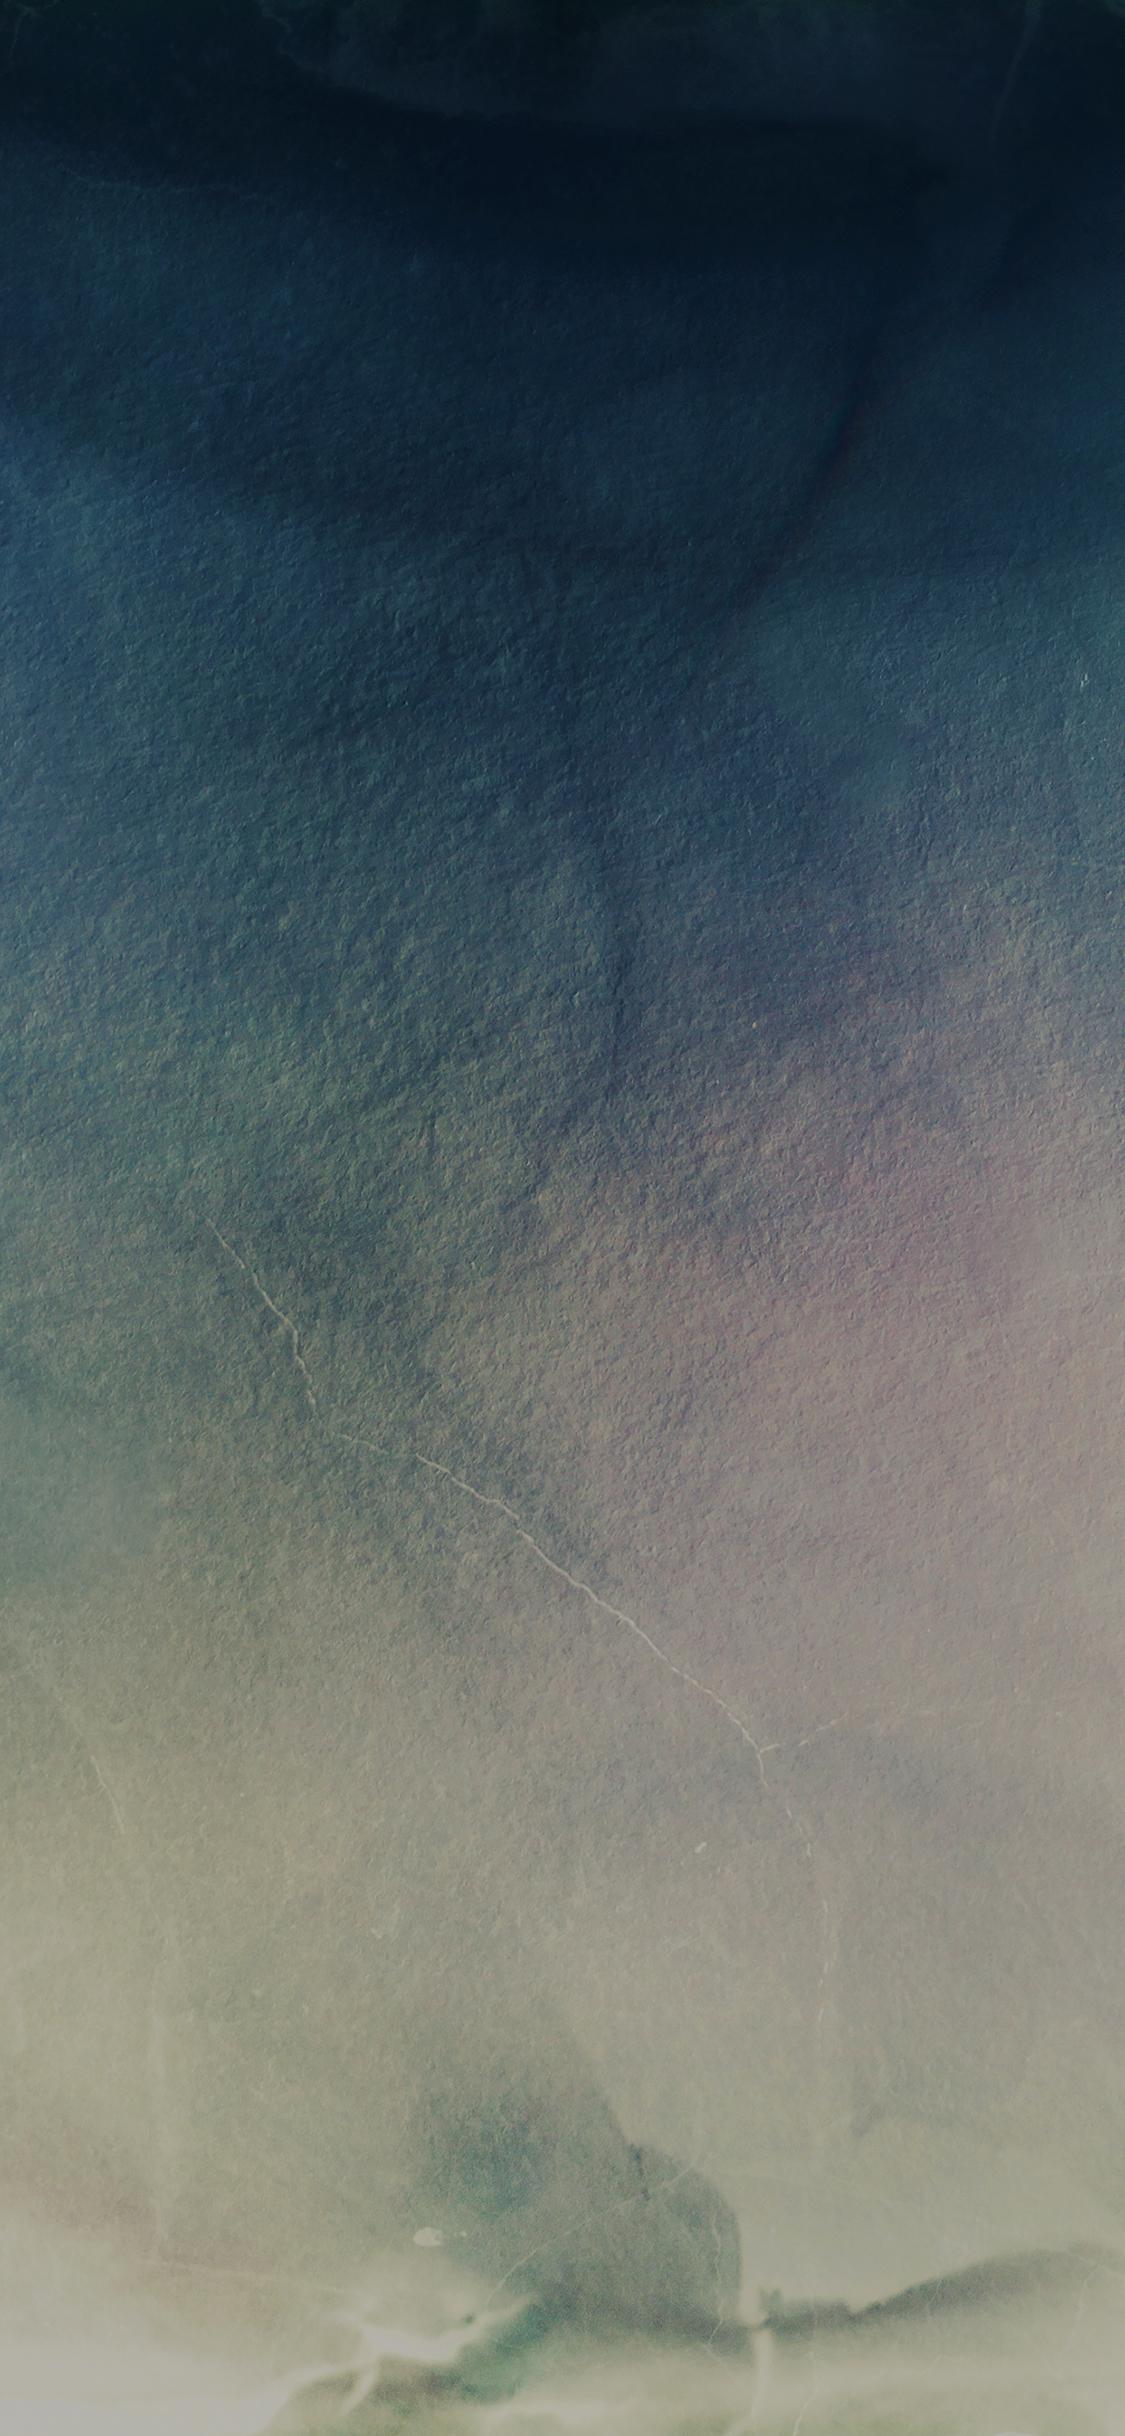 iPhoneXpapers.com-Apple-iPhone-wallpaper-vf14-blue-cream-sandstone-texture-pattern